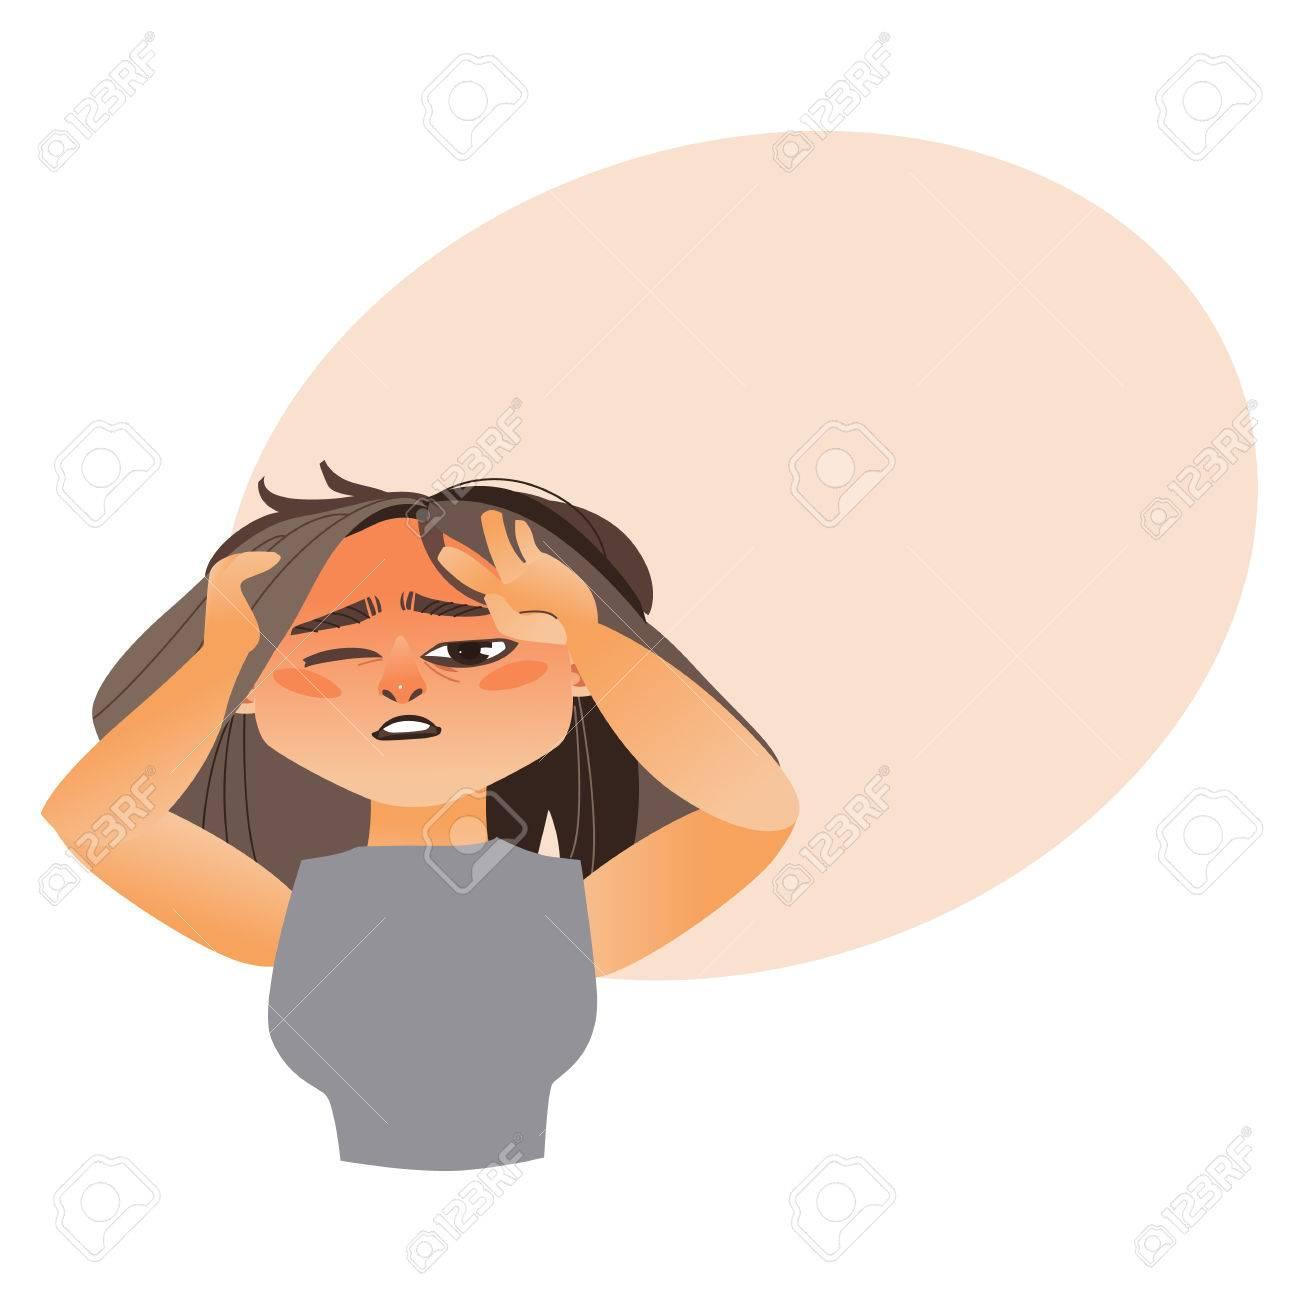 Woman Having Severe Headache Migraine Cartoon Vector Illustration Royalty Free Cliparts Vectors And Stock Illustration Image 84777783